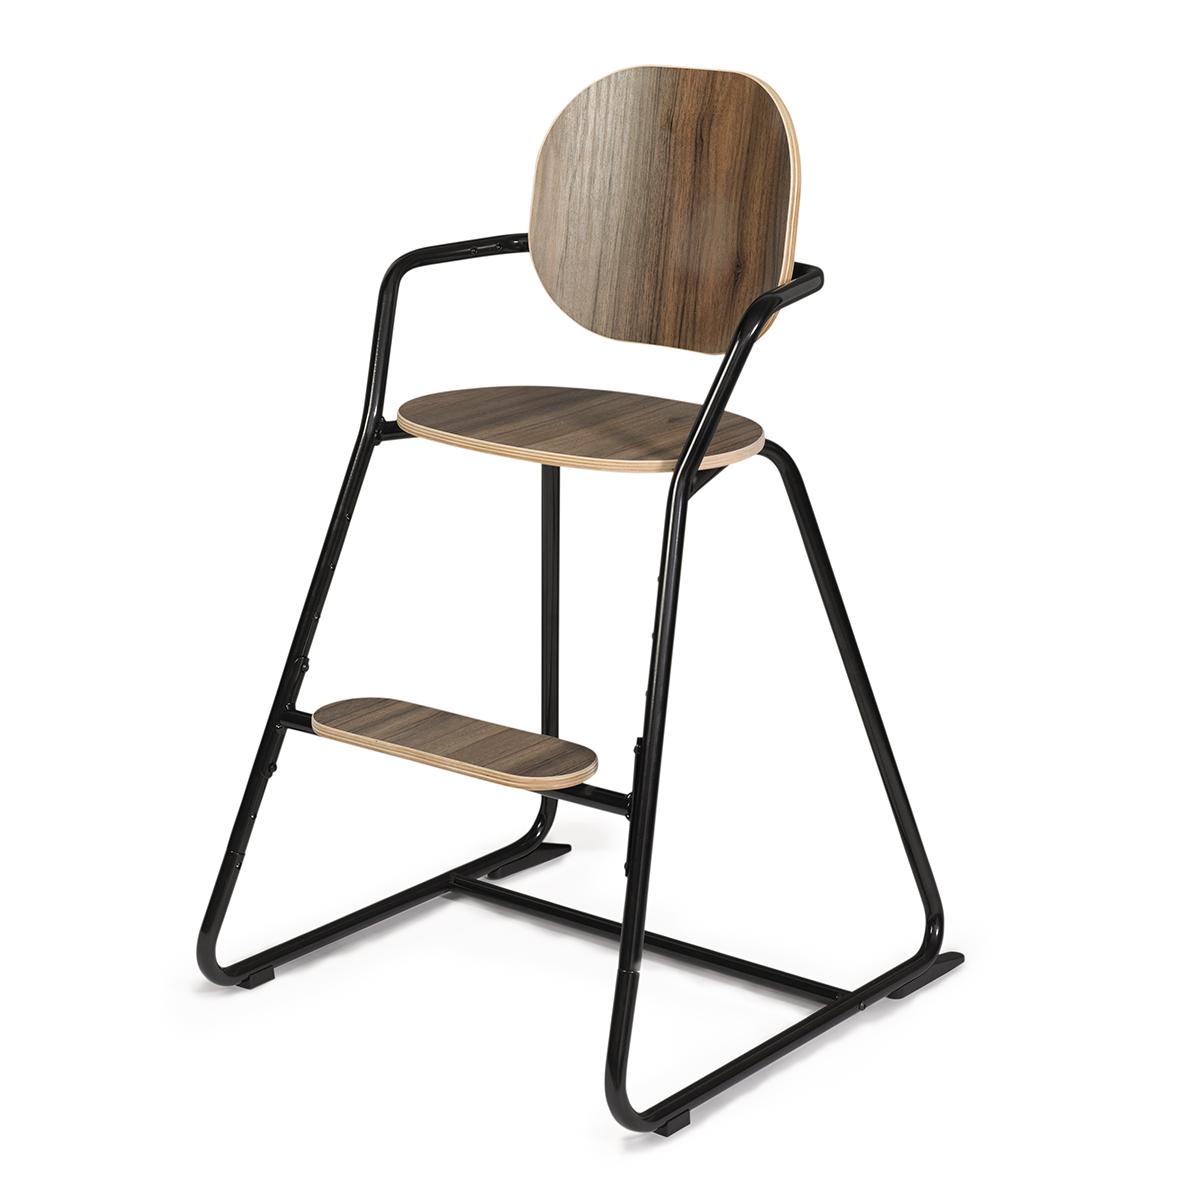 charlie crane chaise haute tibu black edition chaise. Black Bedroom Furniture Sets. Home Design Ideas